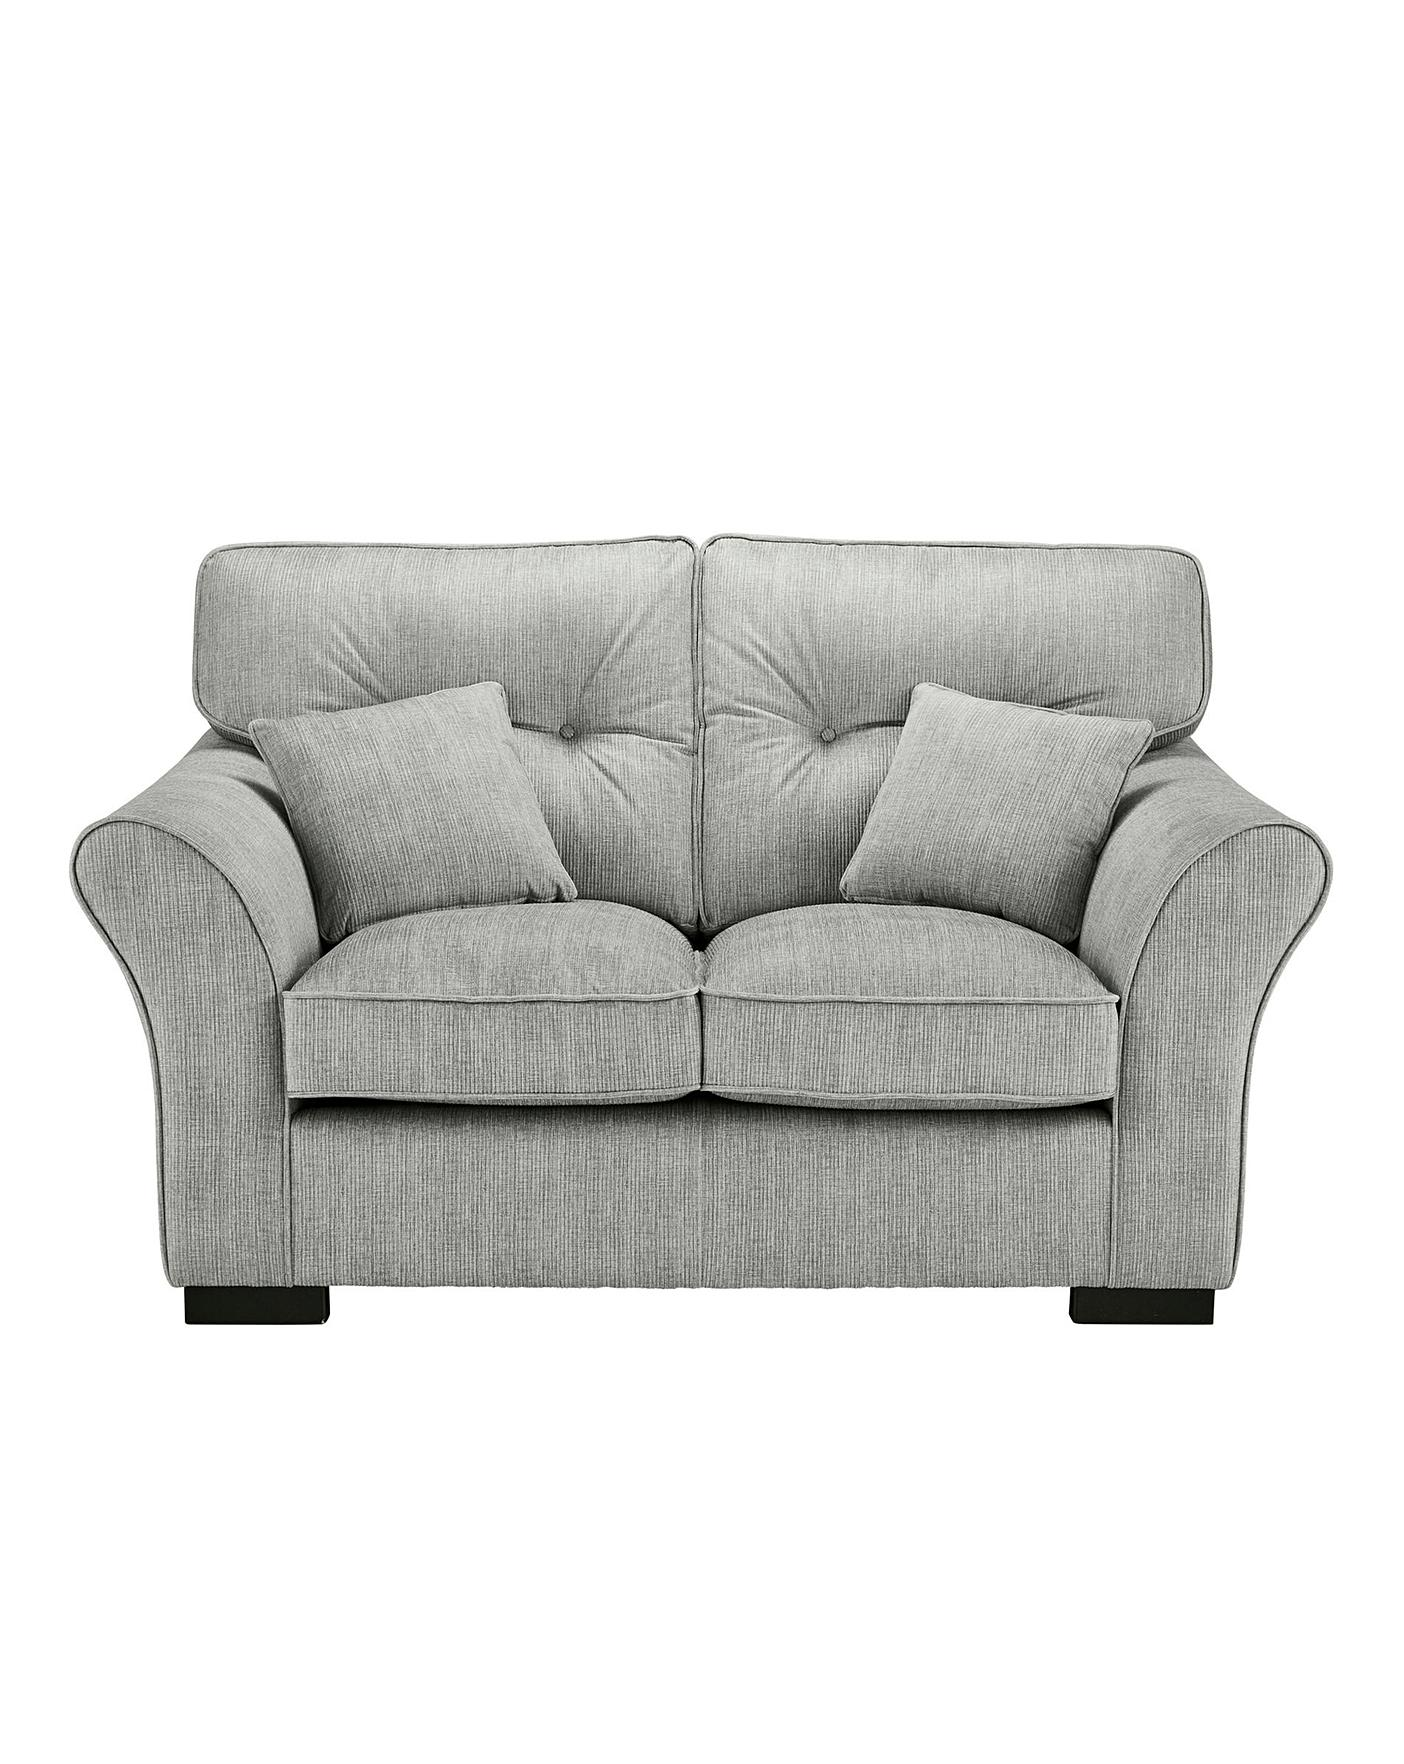 Pleasant Louis 2 Seater Sofa Machost Co Dining Chair Design Ideas Machostcouk